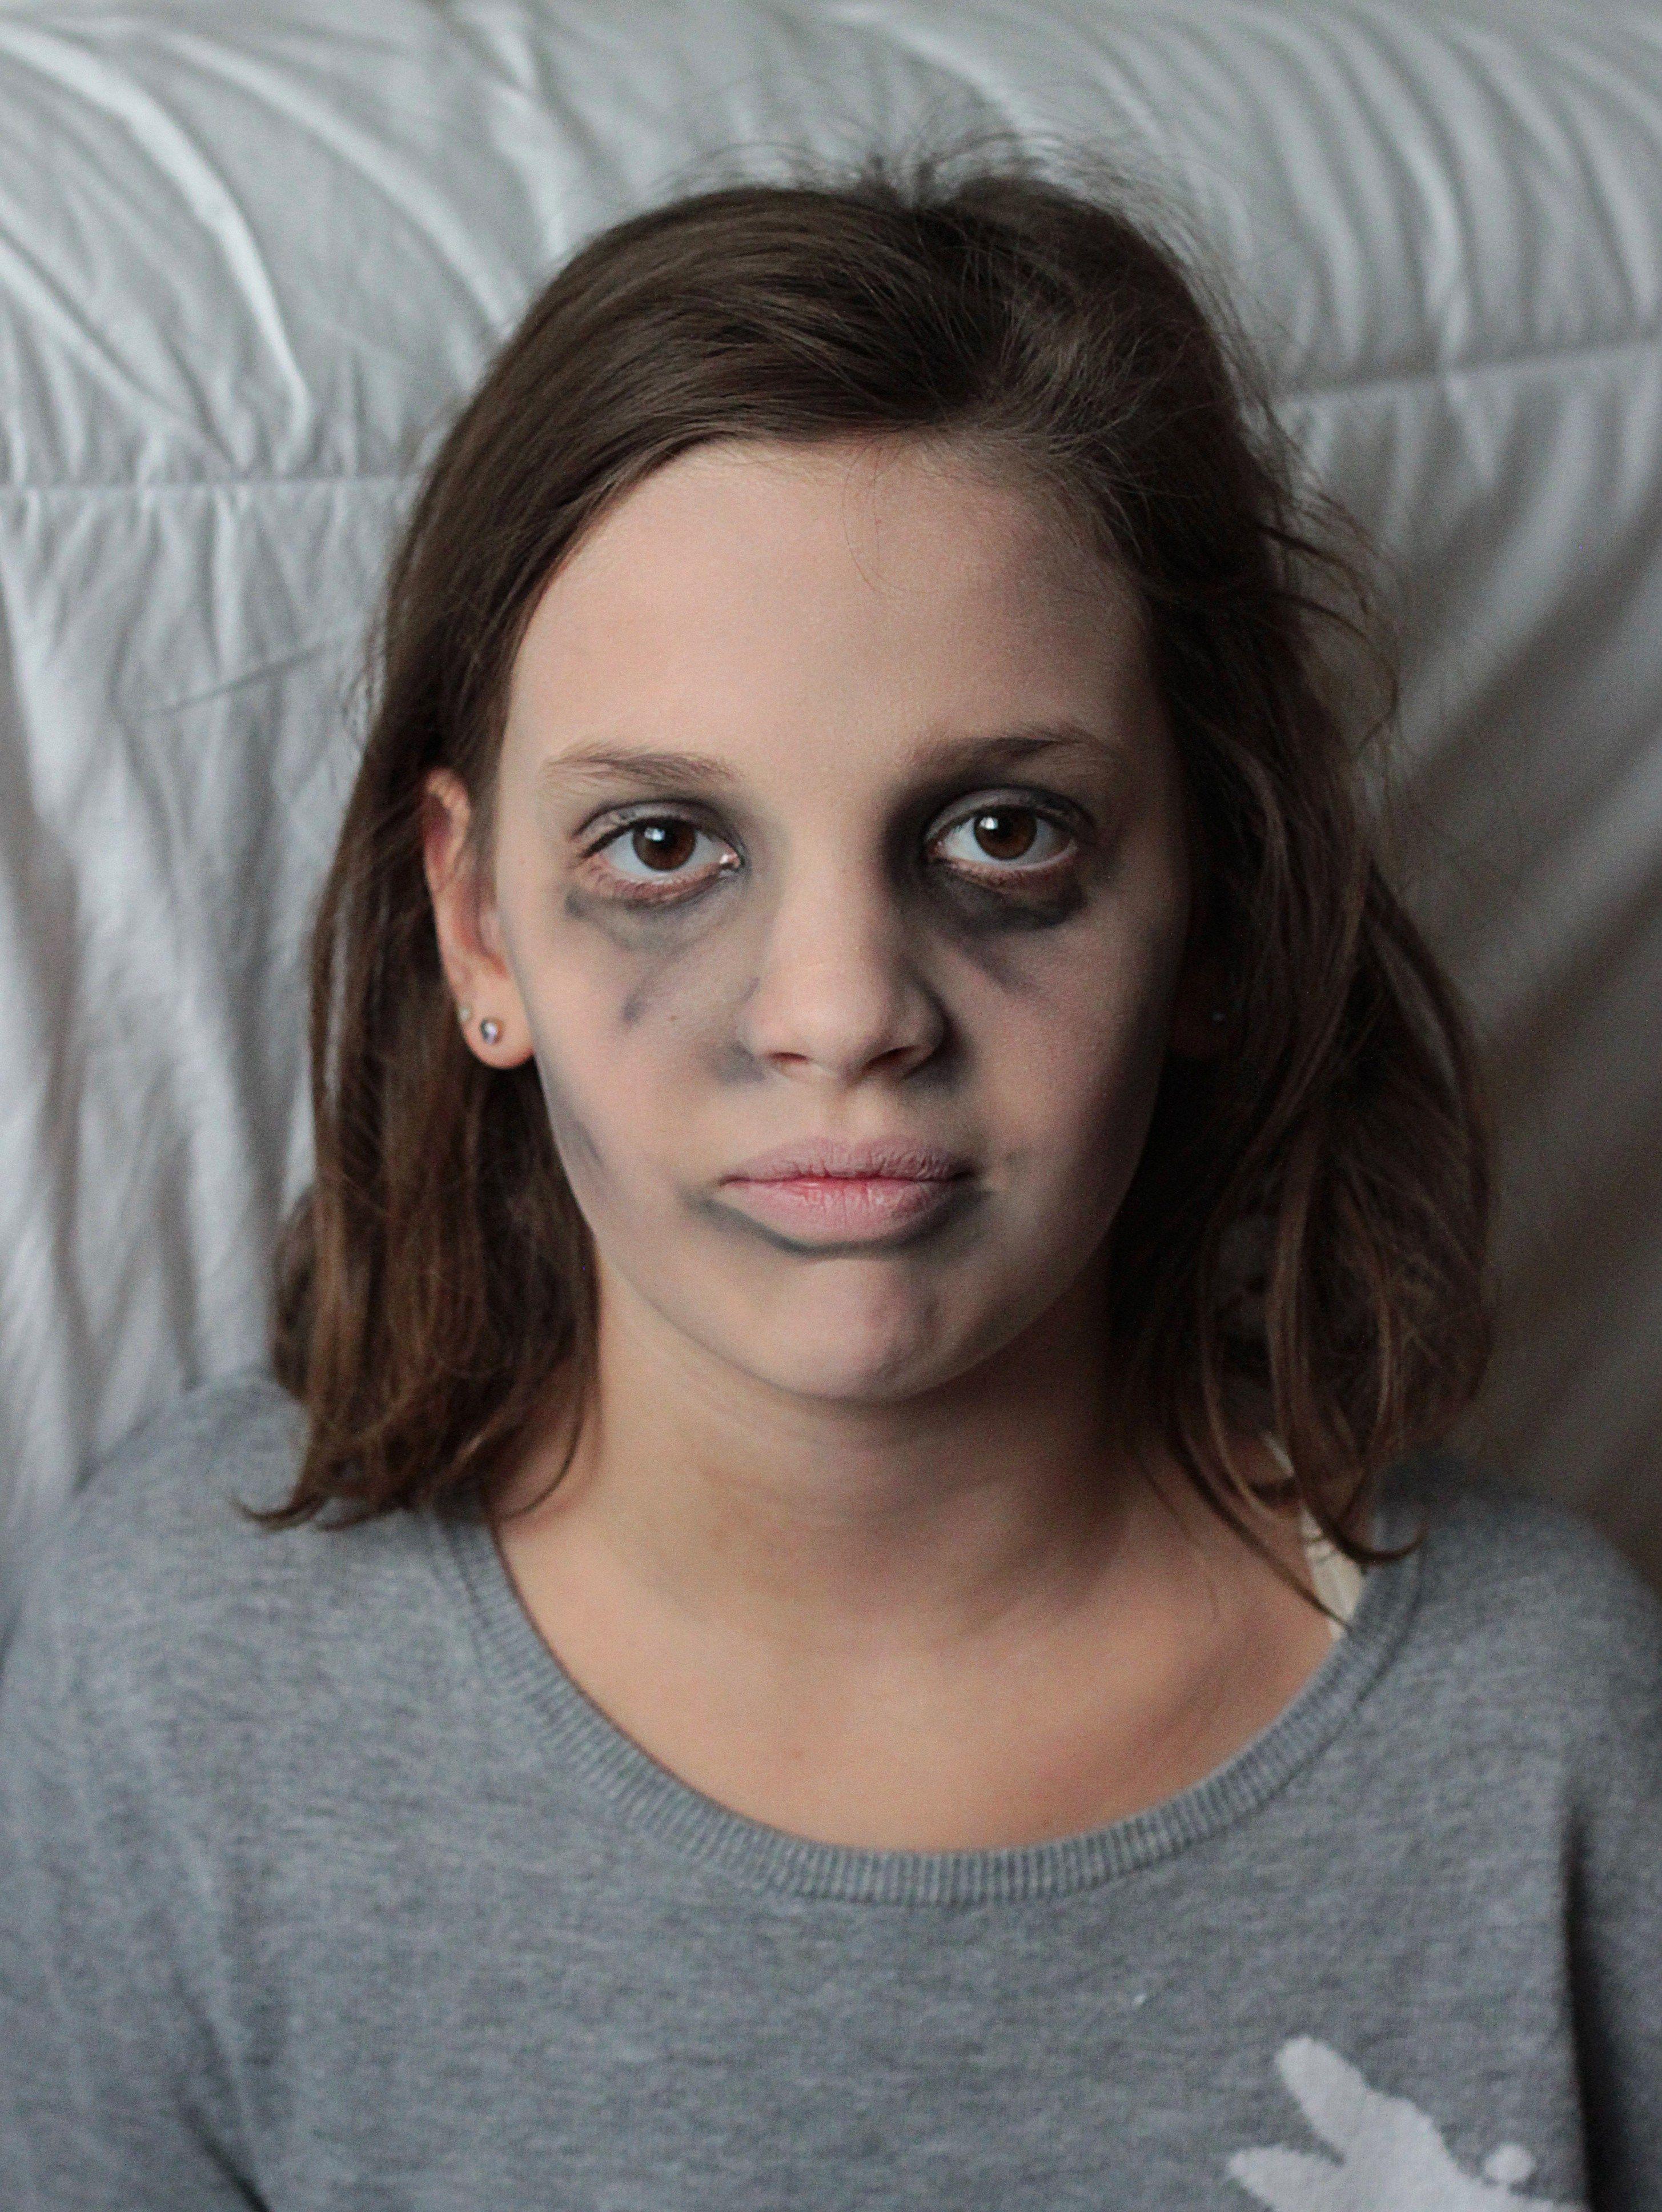 Simple Zombie Makeup For Kids Kids Zombie Makeup Zombie Makeup Easy Zombie Costume Kids